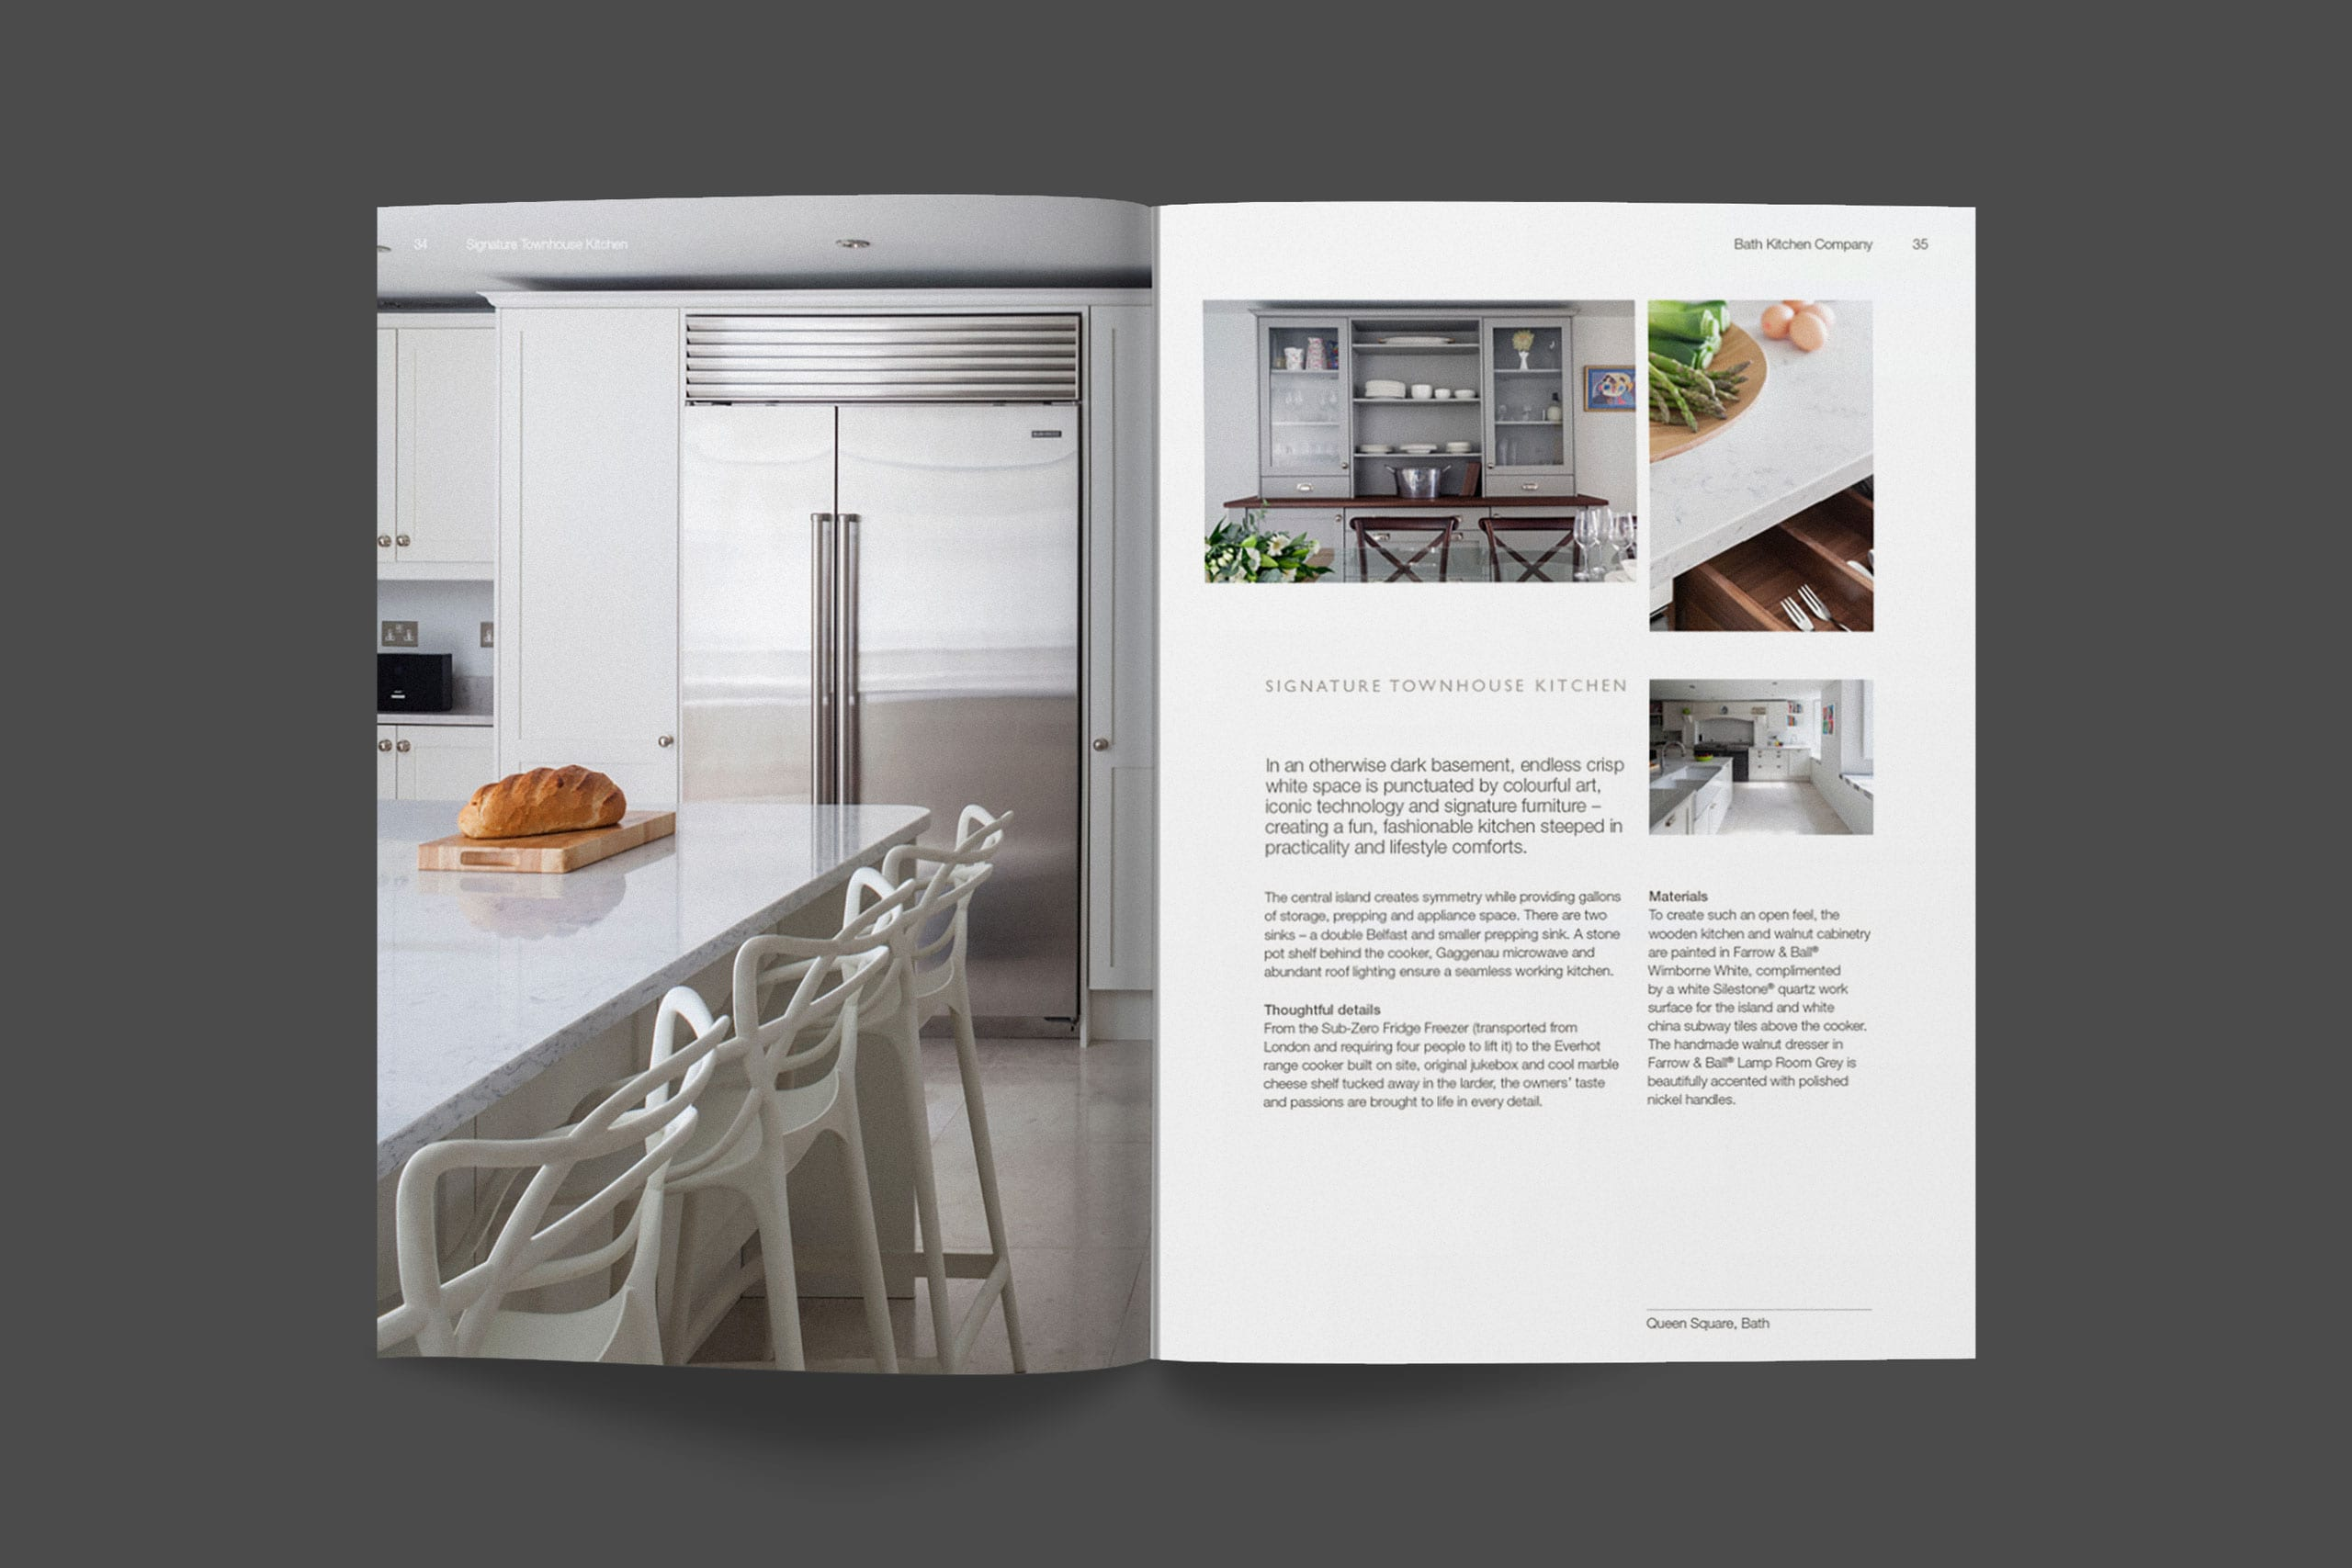 Bath Kitchen Company brochure spreads